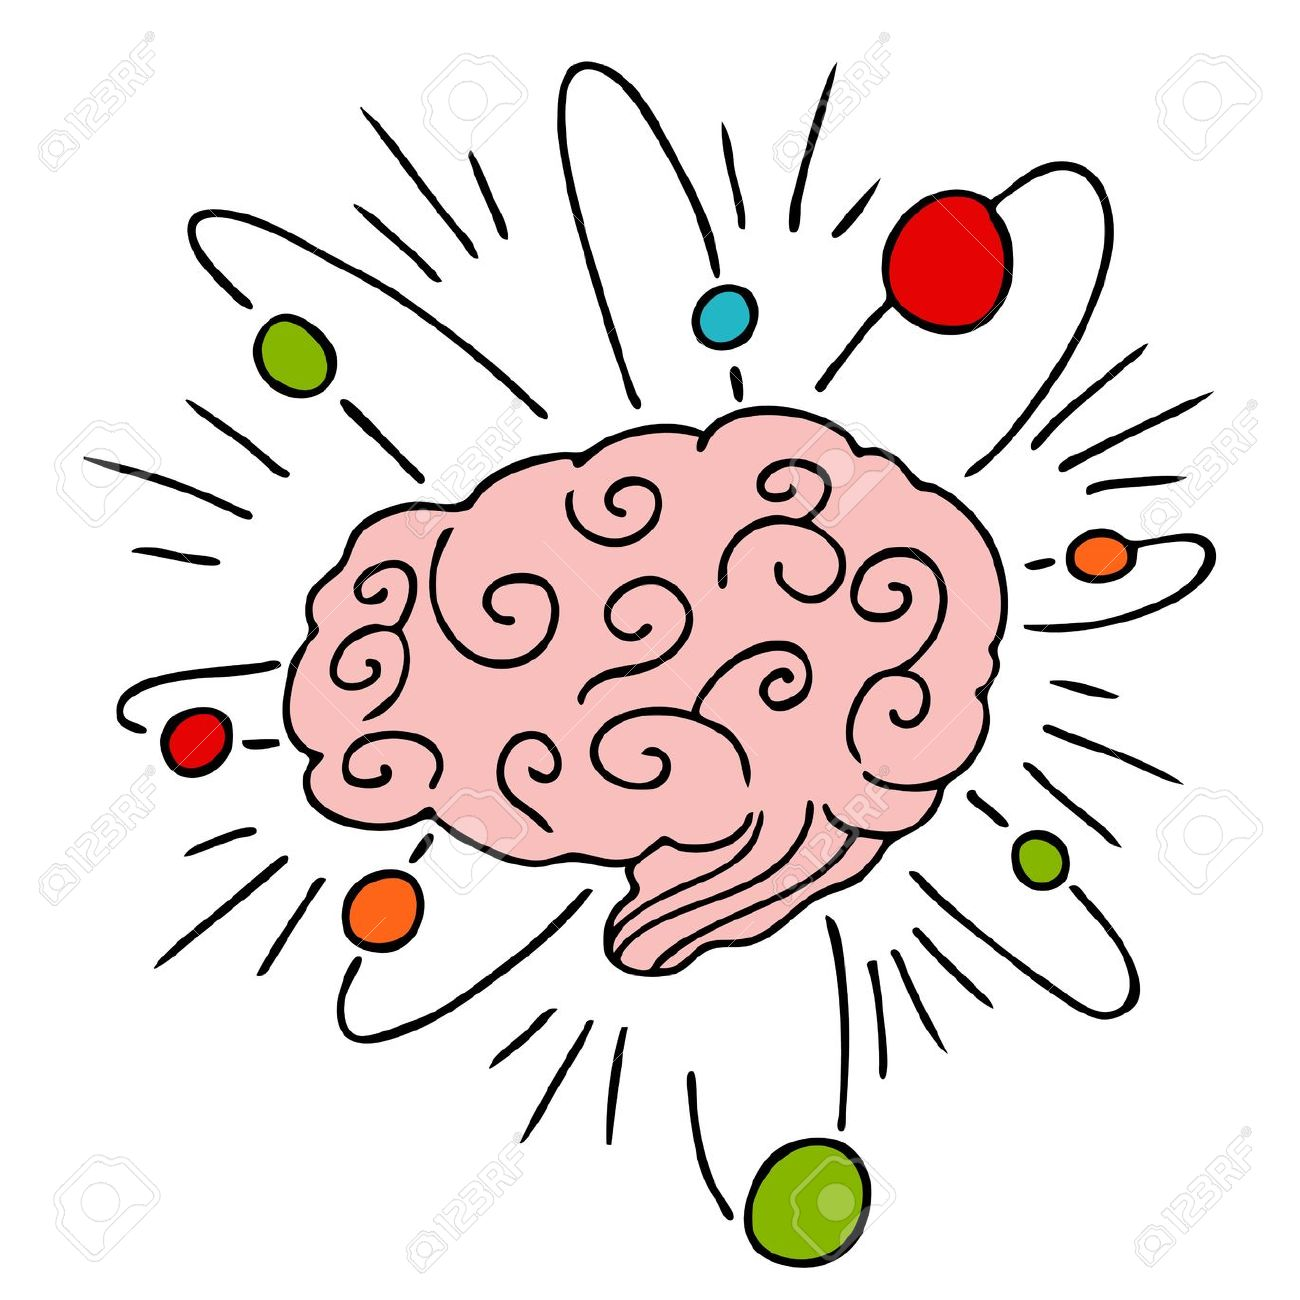 Cartoon Brain Clipart   Free download best Cartoon Brain Clipart ... for Smart Cartoon Brain  575lpg